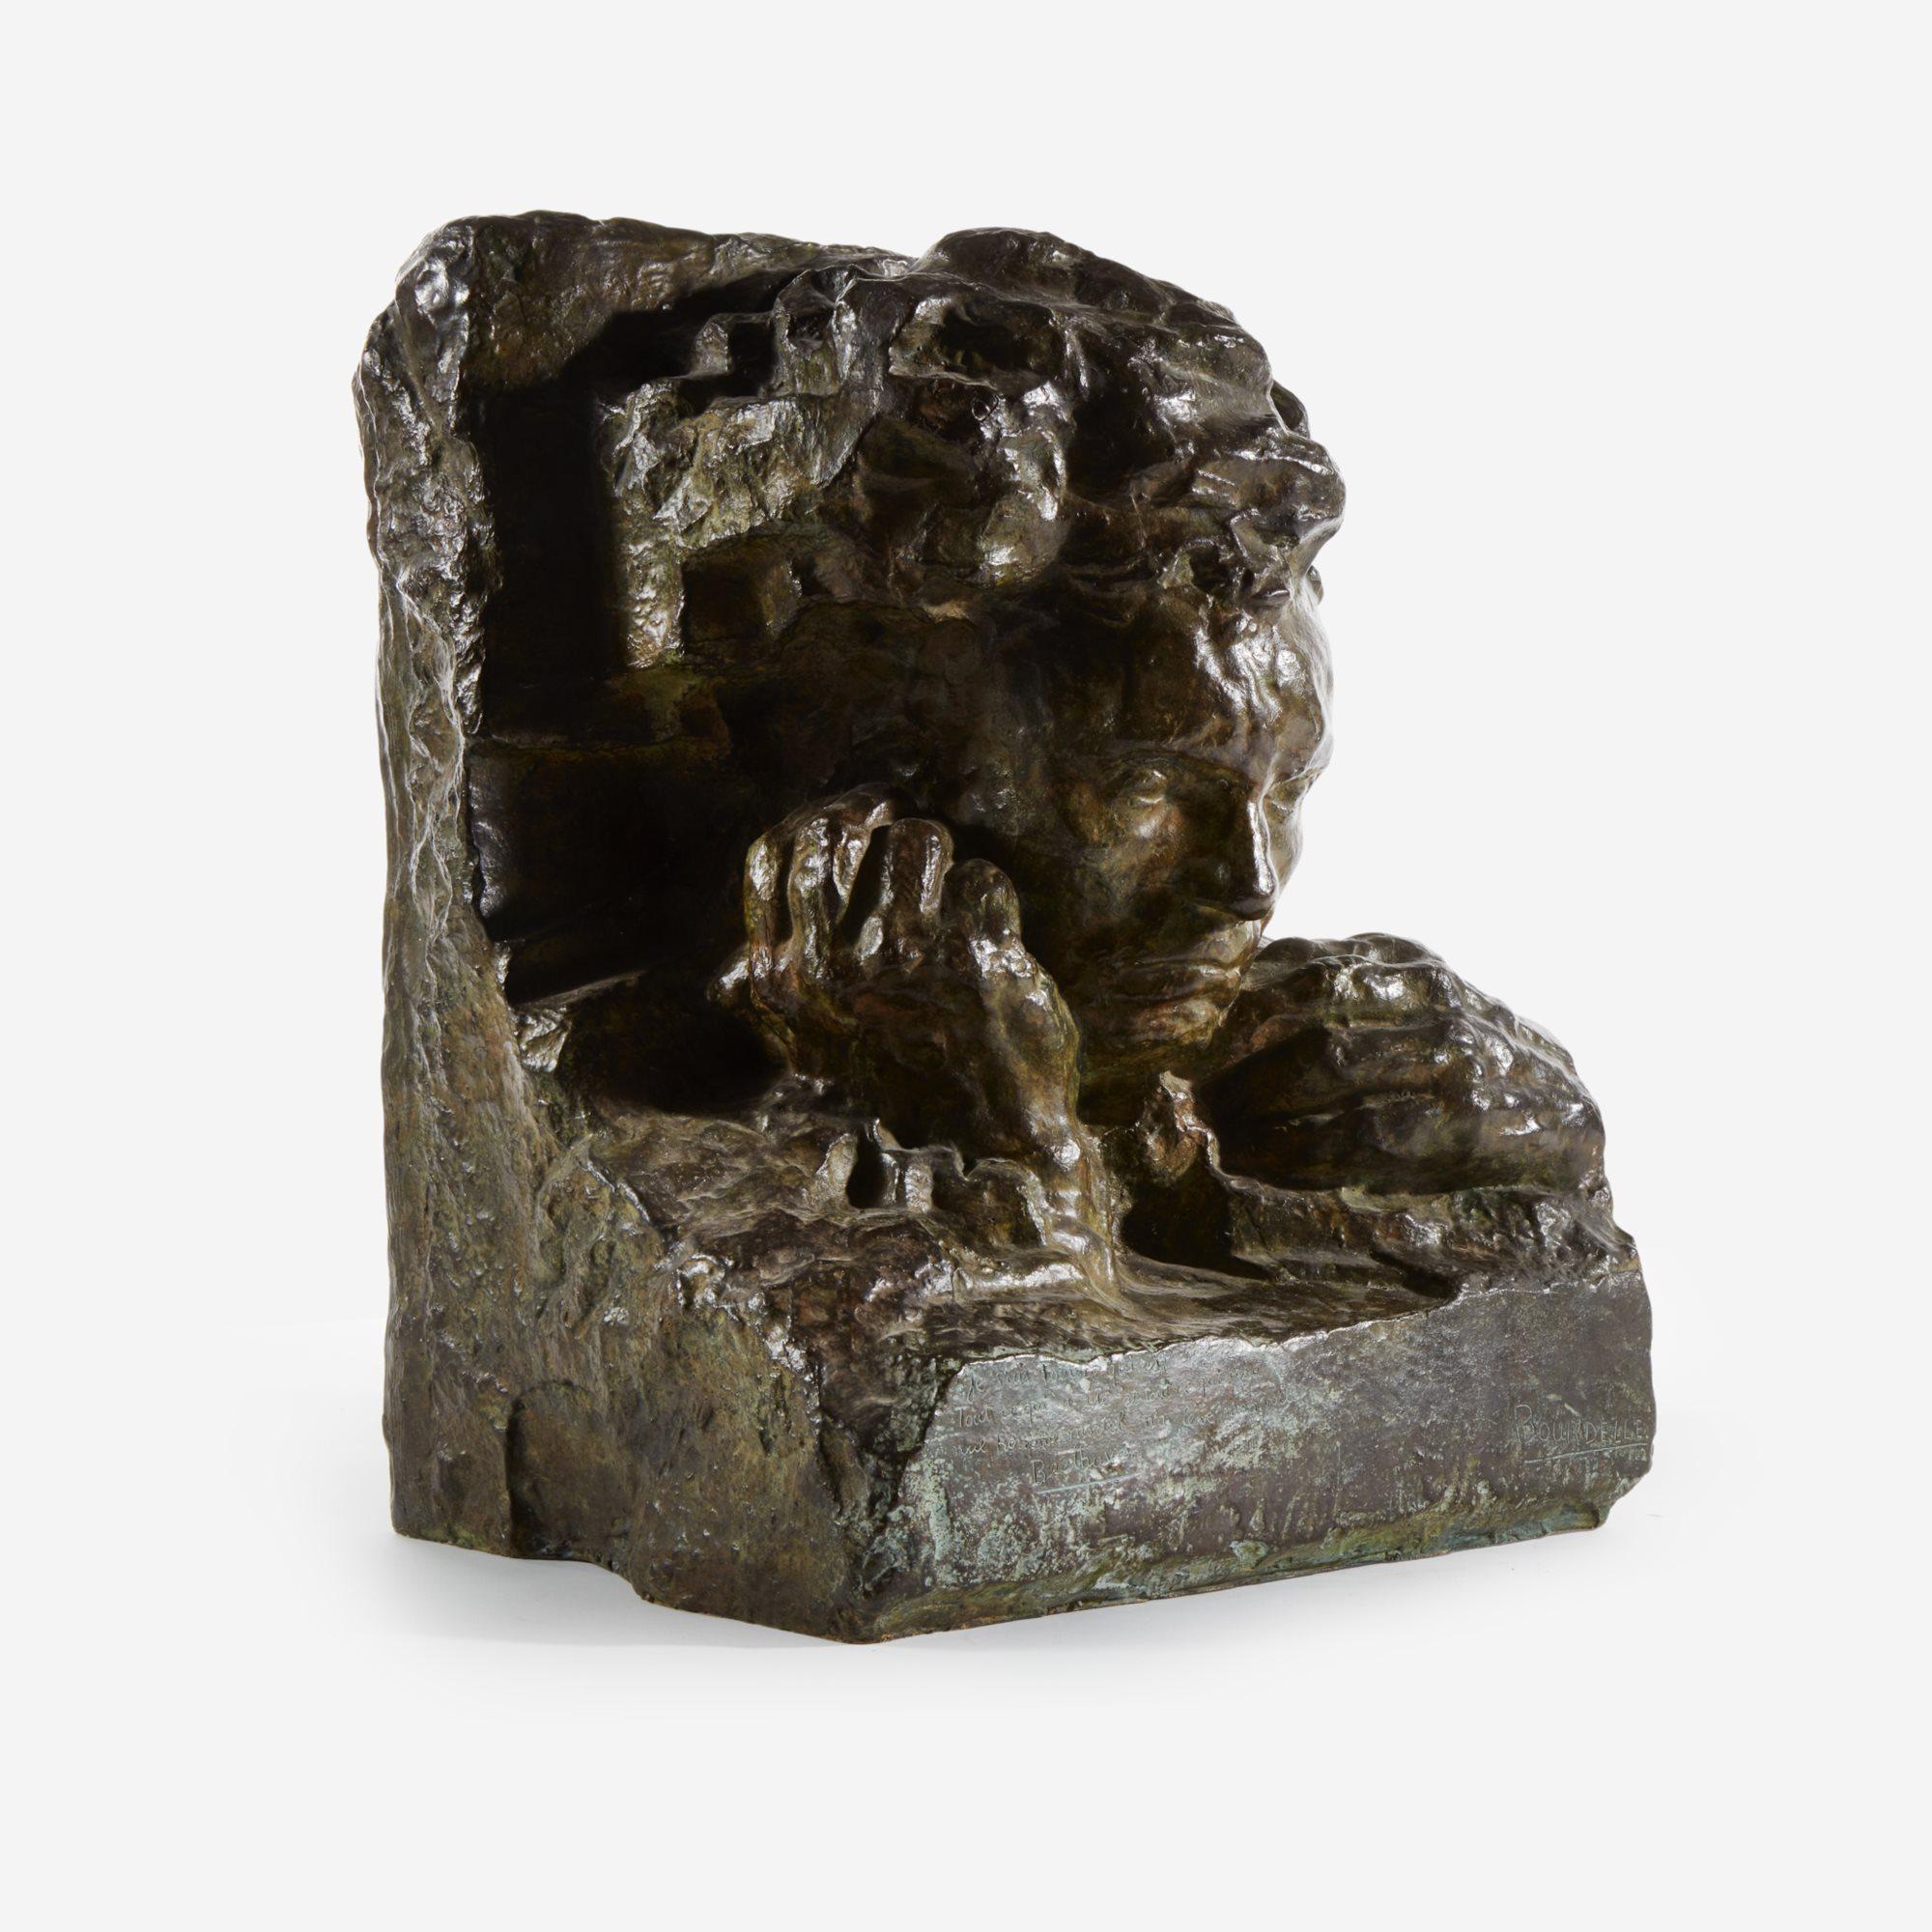 Lot 9 | Beethoven à Deux Mains, Sold for $93,750